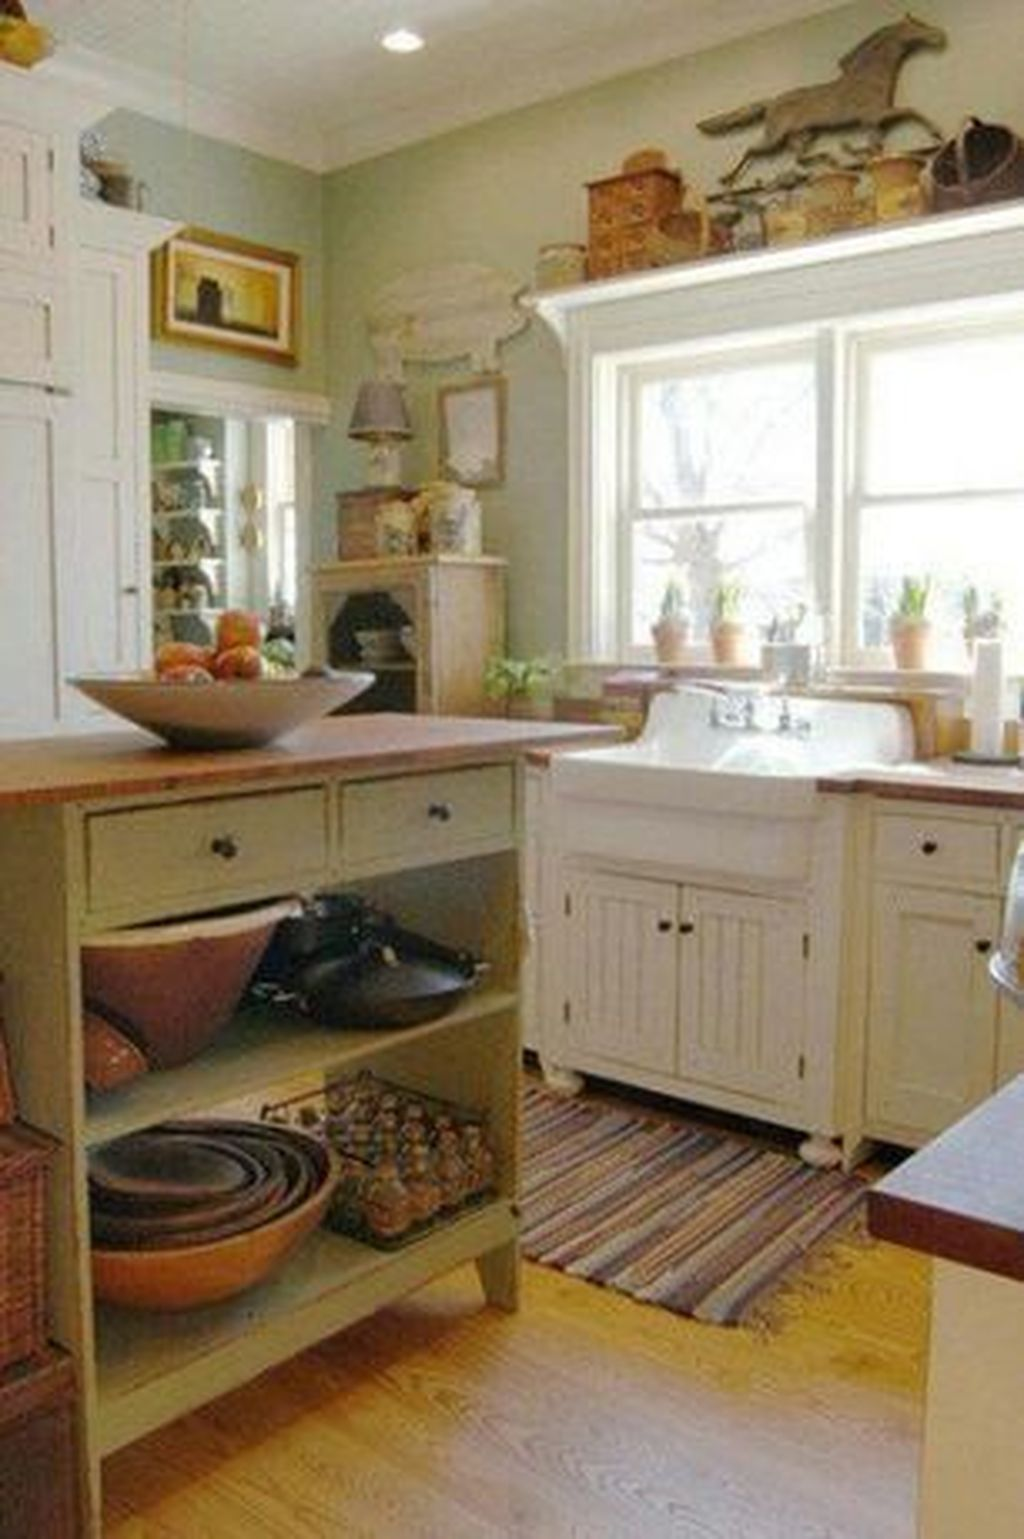 88 Modern European Farmhouse Kitchen Cabinet Ideas  Farmhouse New Cottage Style Kitchen Cabinets Decorating Design